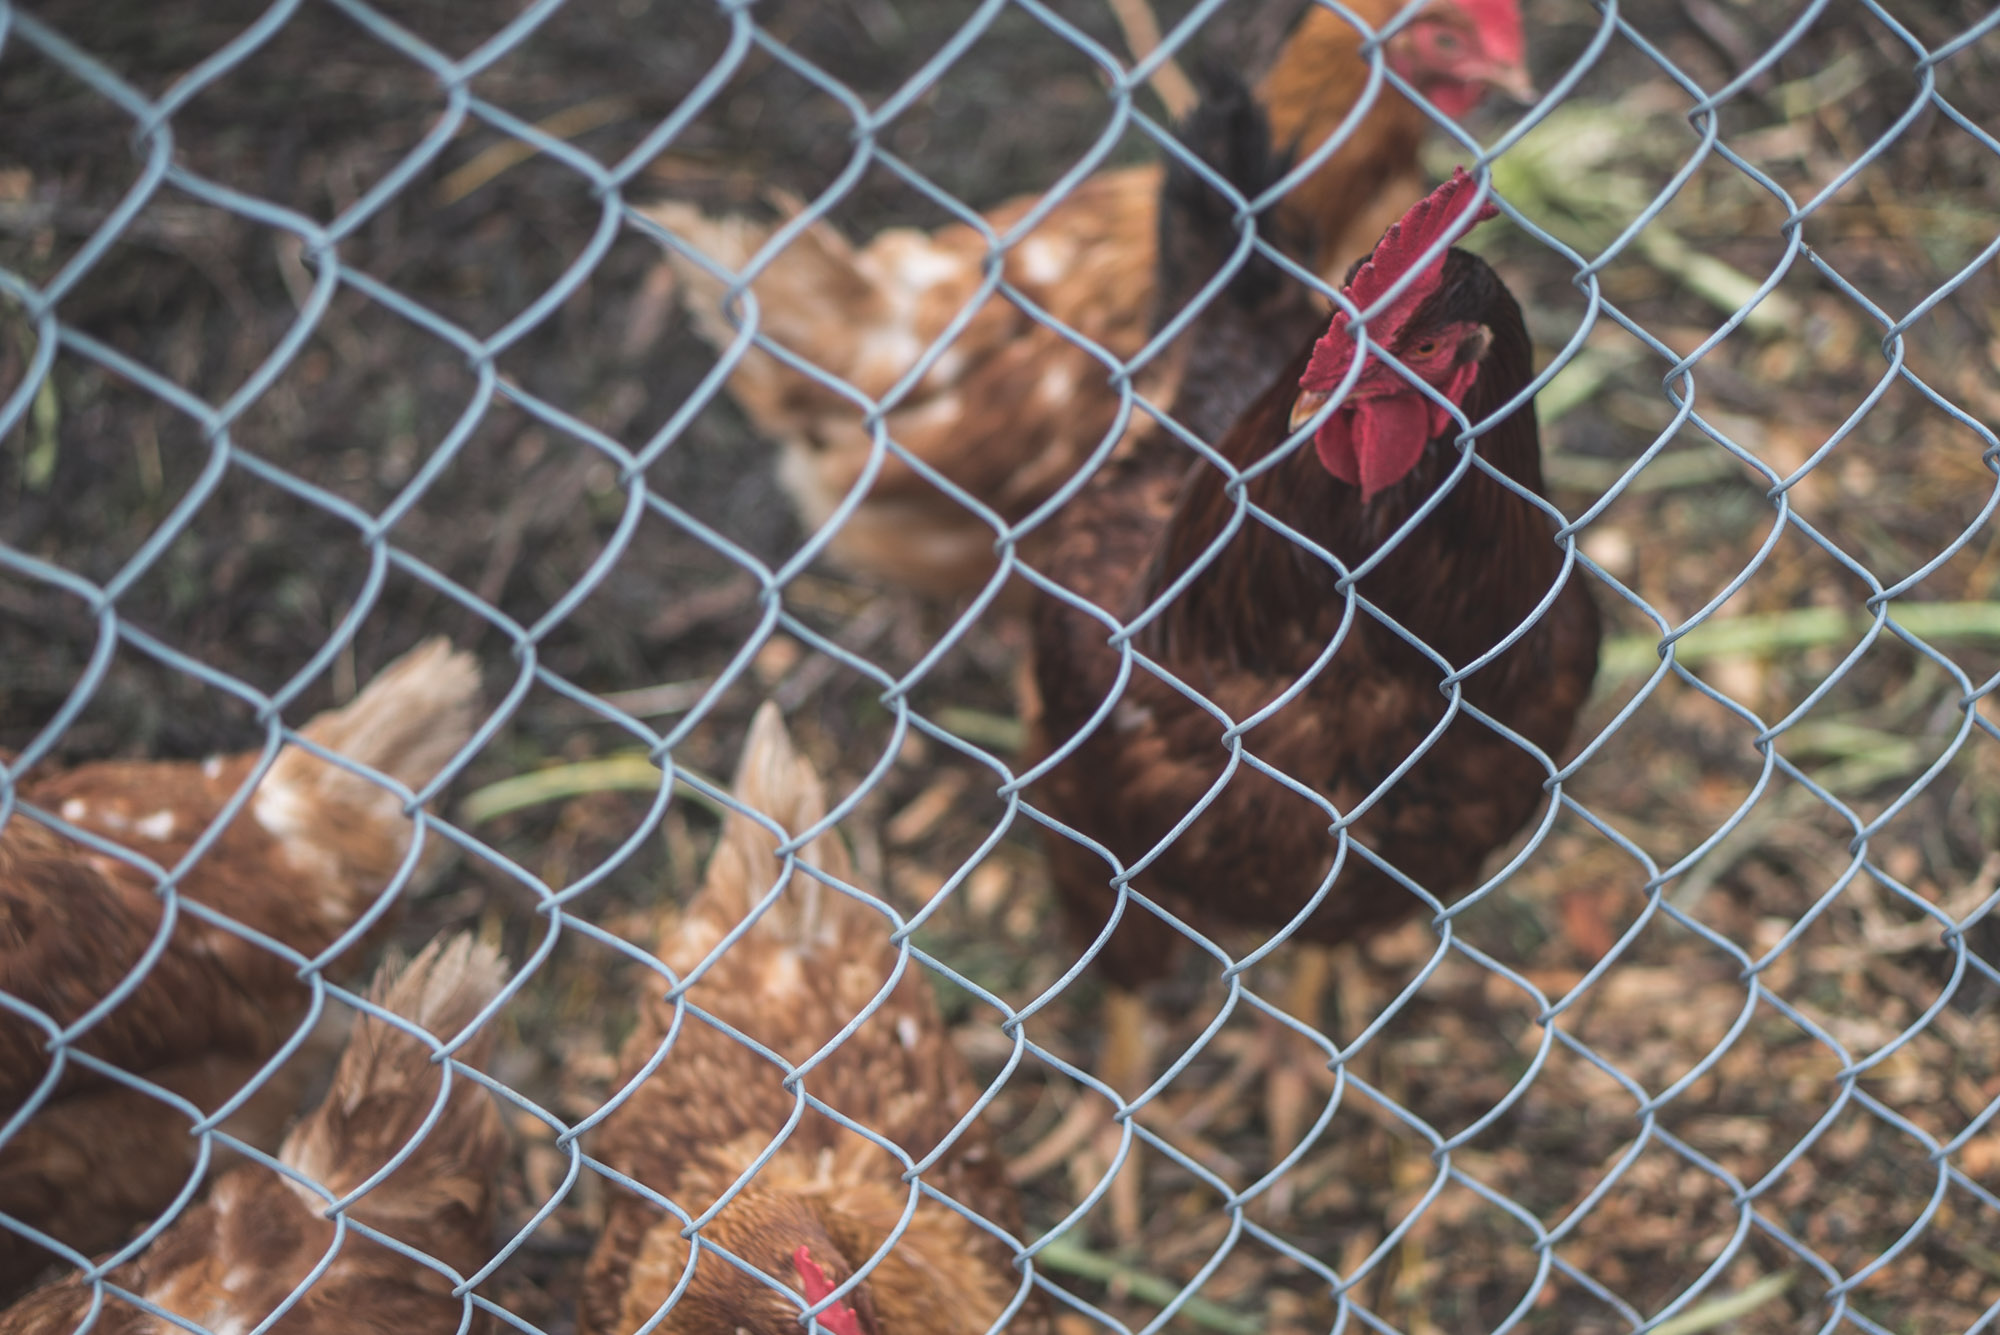 women-who-farm-over-grow-the-system-9.jpg